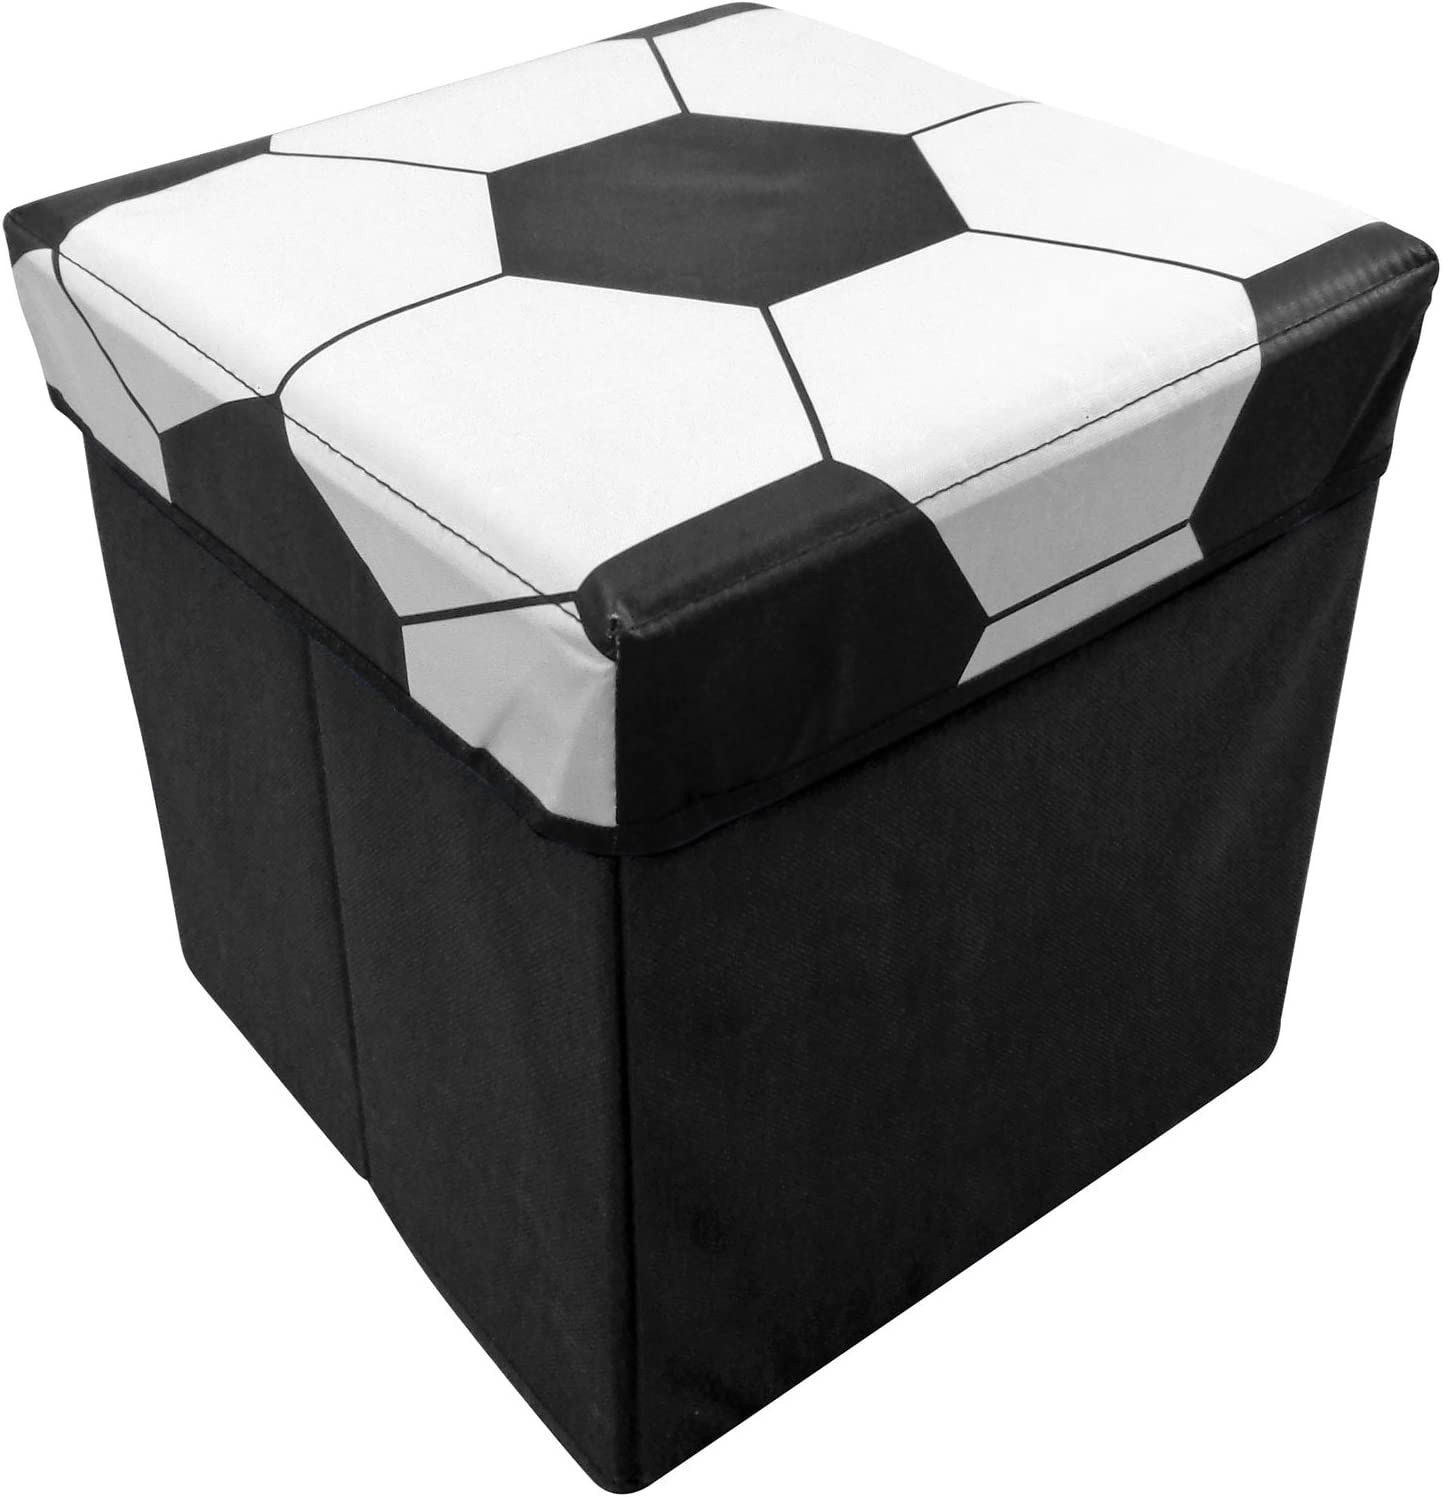 Country Club - Caja de almacenaje infantil con tapa (cuadrada, 30 x 30 x 32 cm), tapa con diseño de pelota, color negro: Amazon.es: Hogar